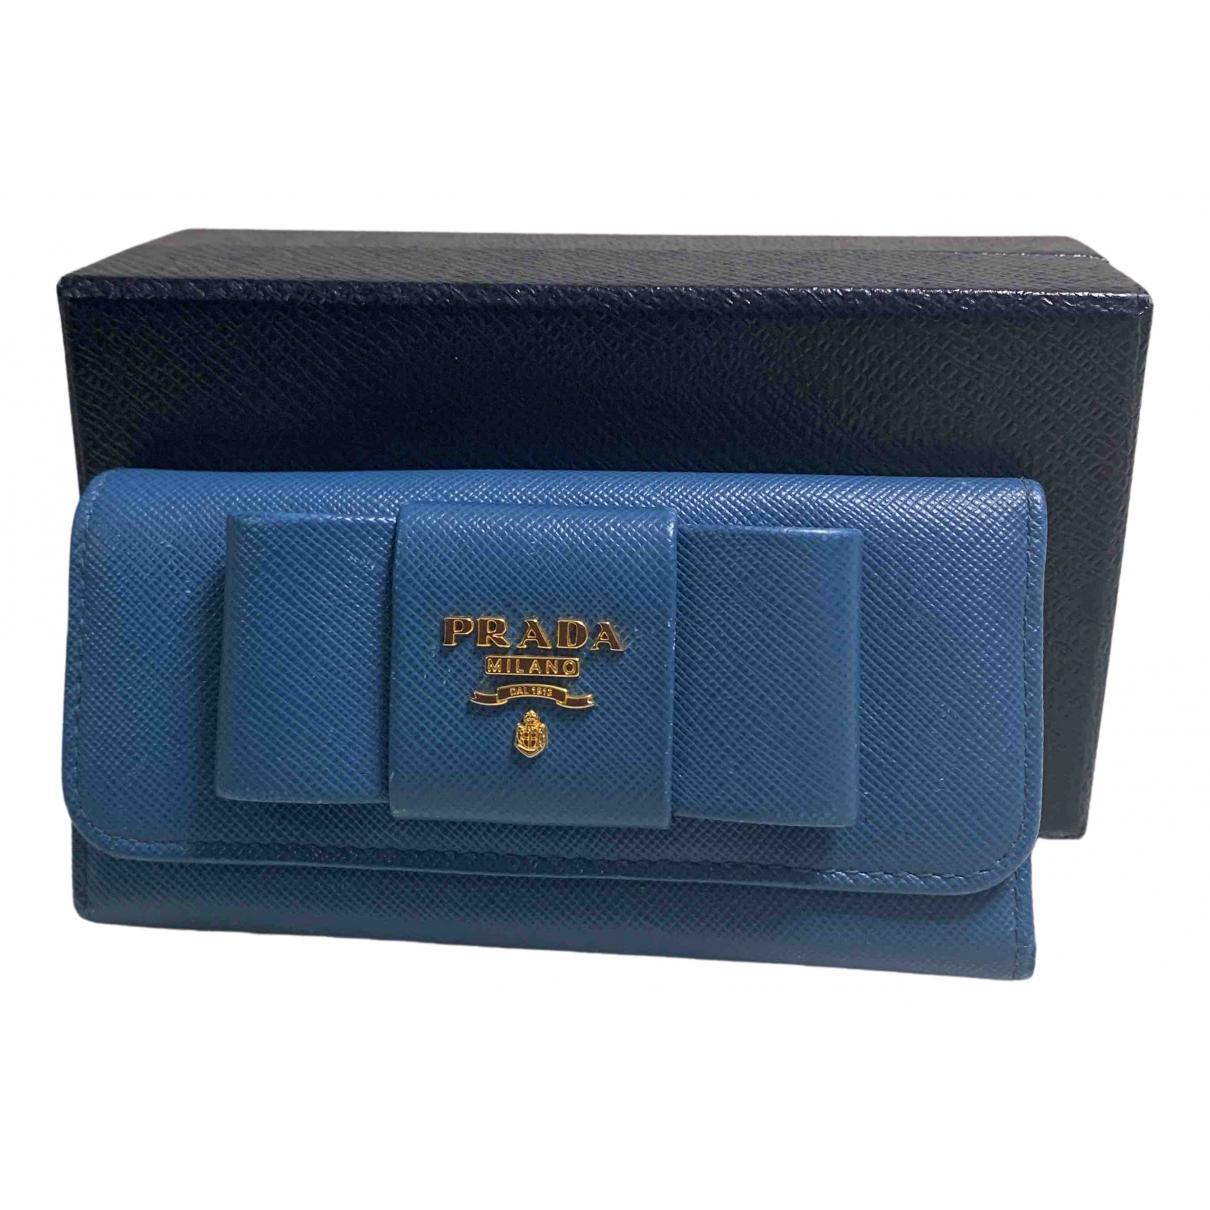 Prada N Blue Leather Purses, wallet & cases for Women N